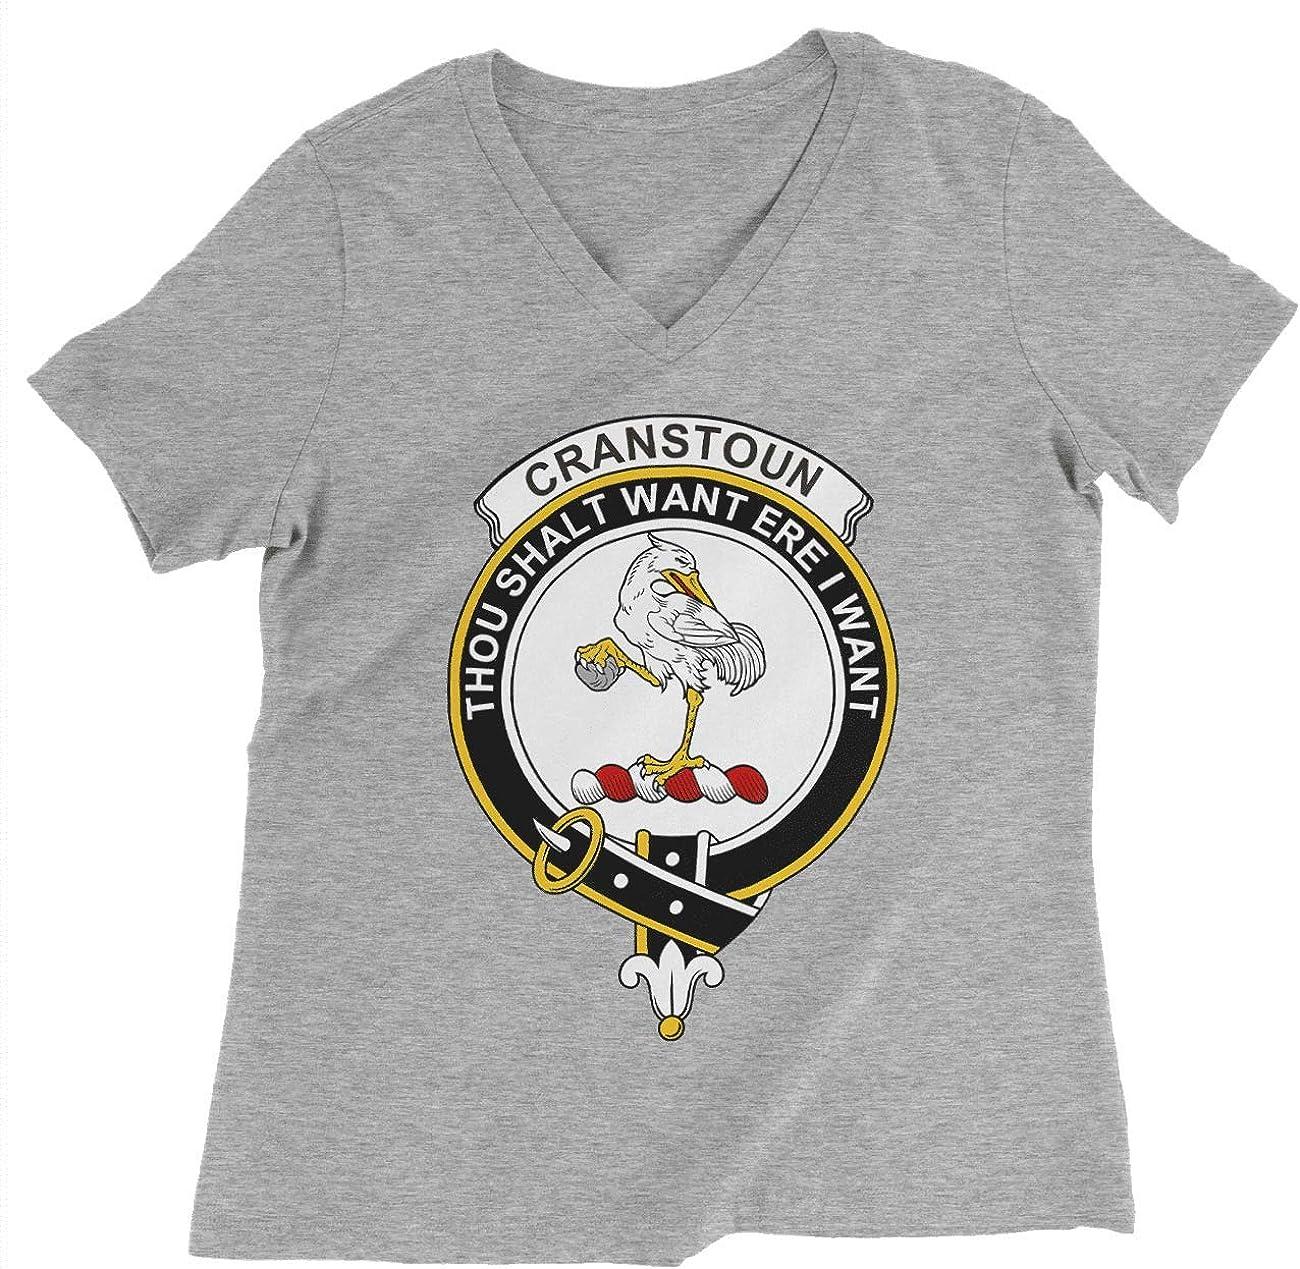 HARD EDGE DESIGN Women's Scottish Clan Crest Badge Cranstoun T-Shirt